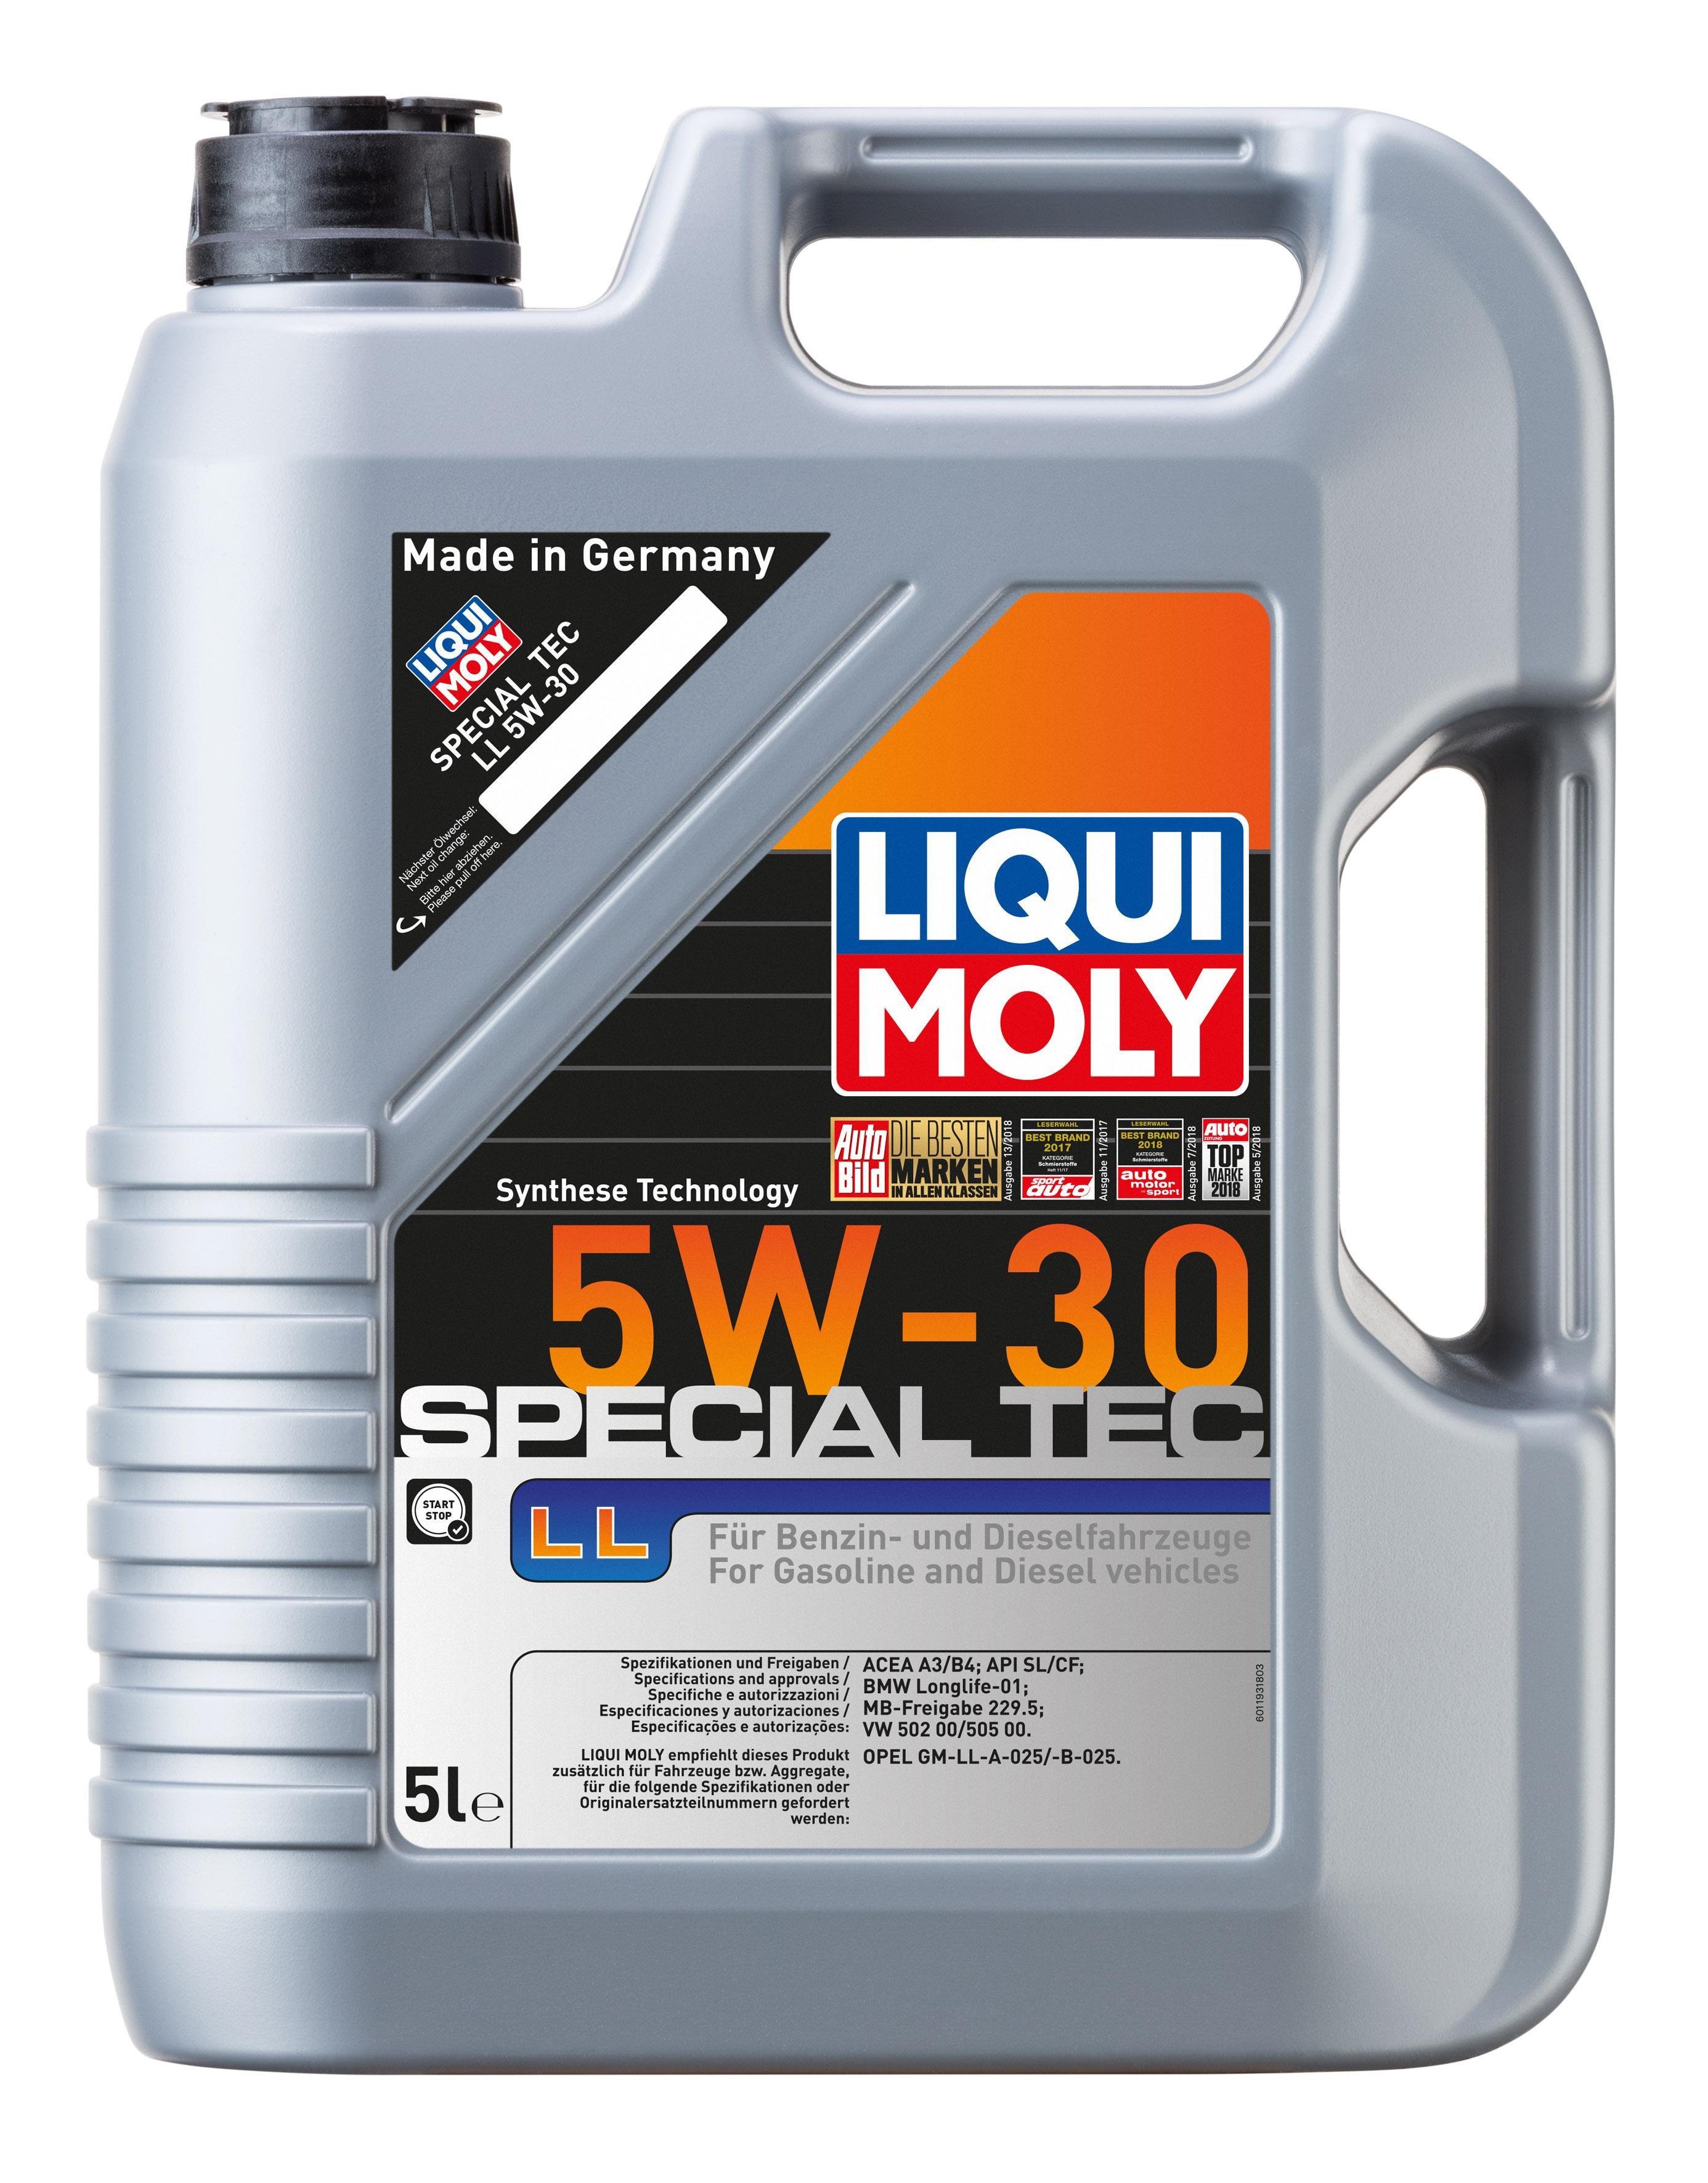 1193 LIQUI MOLY Motoröl Bewertung